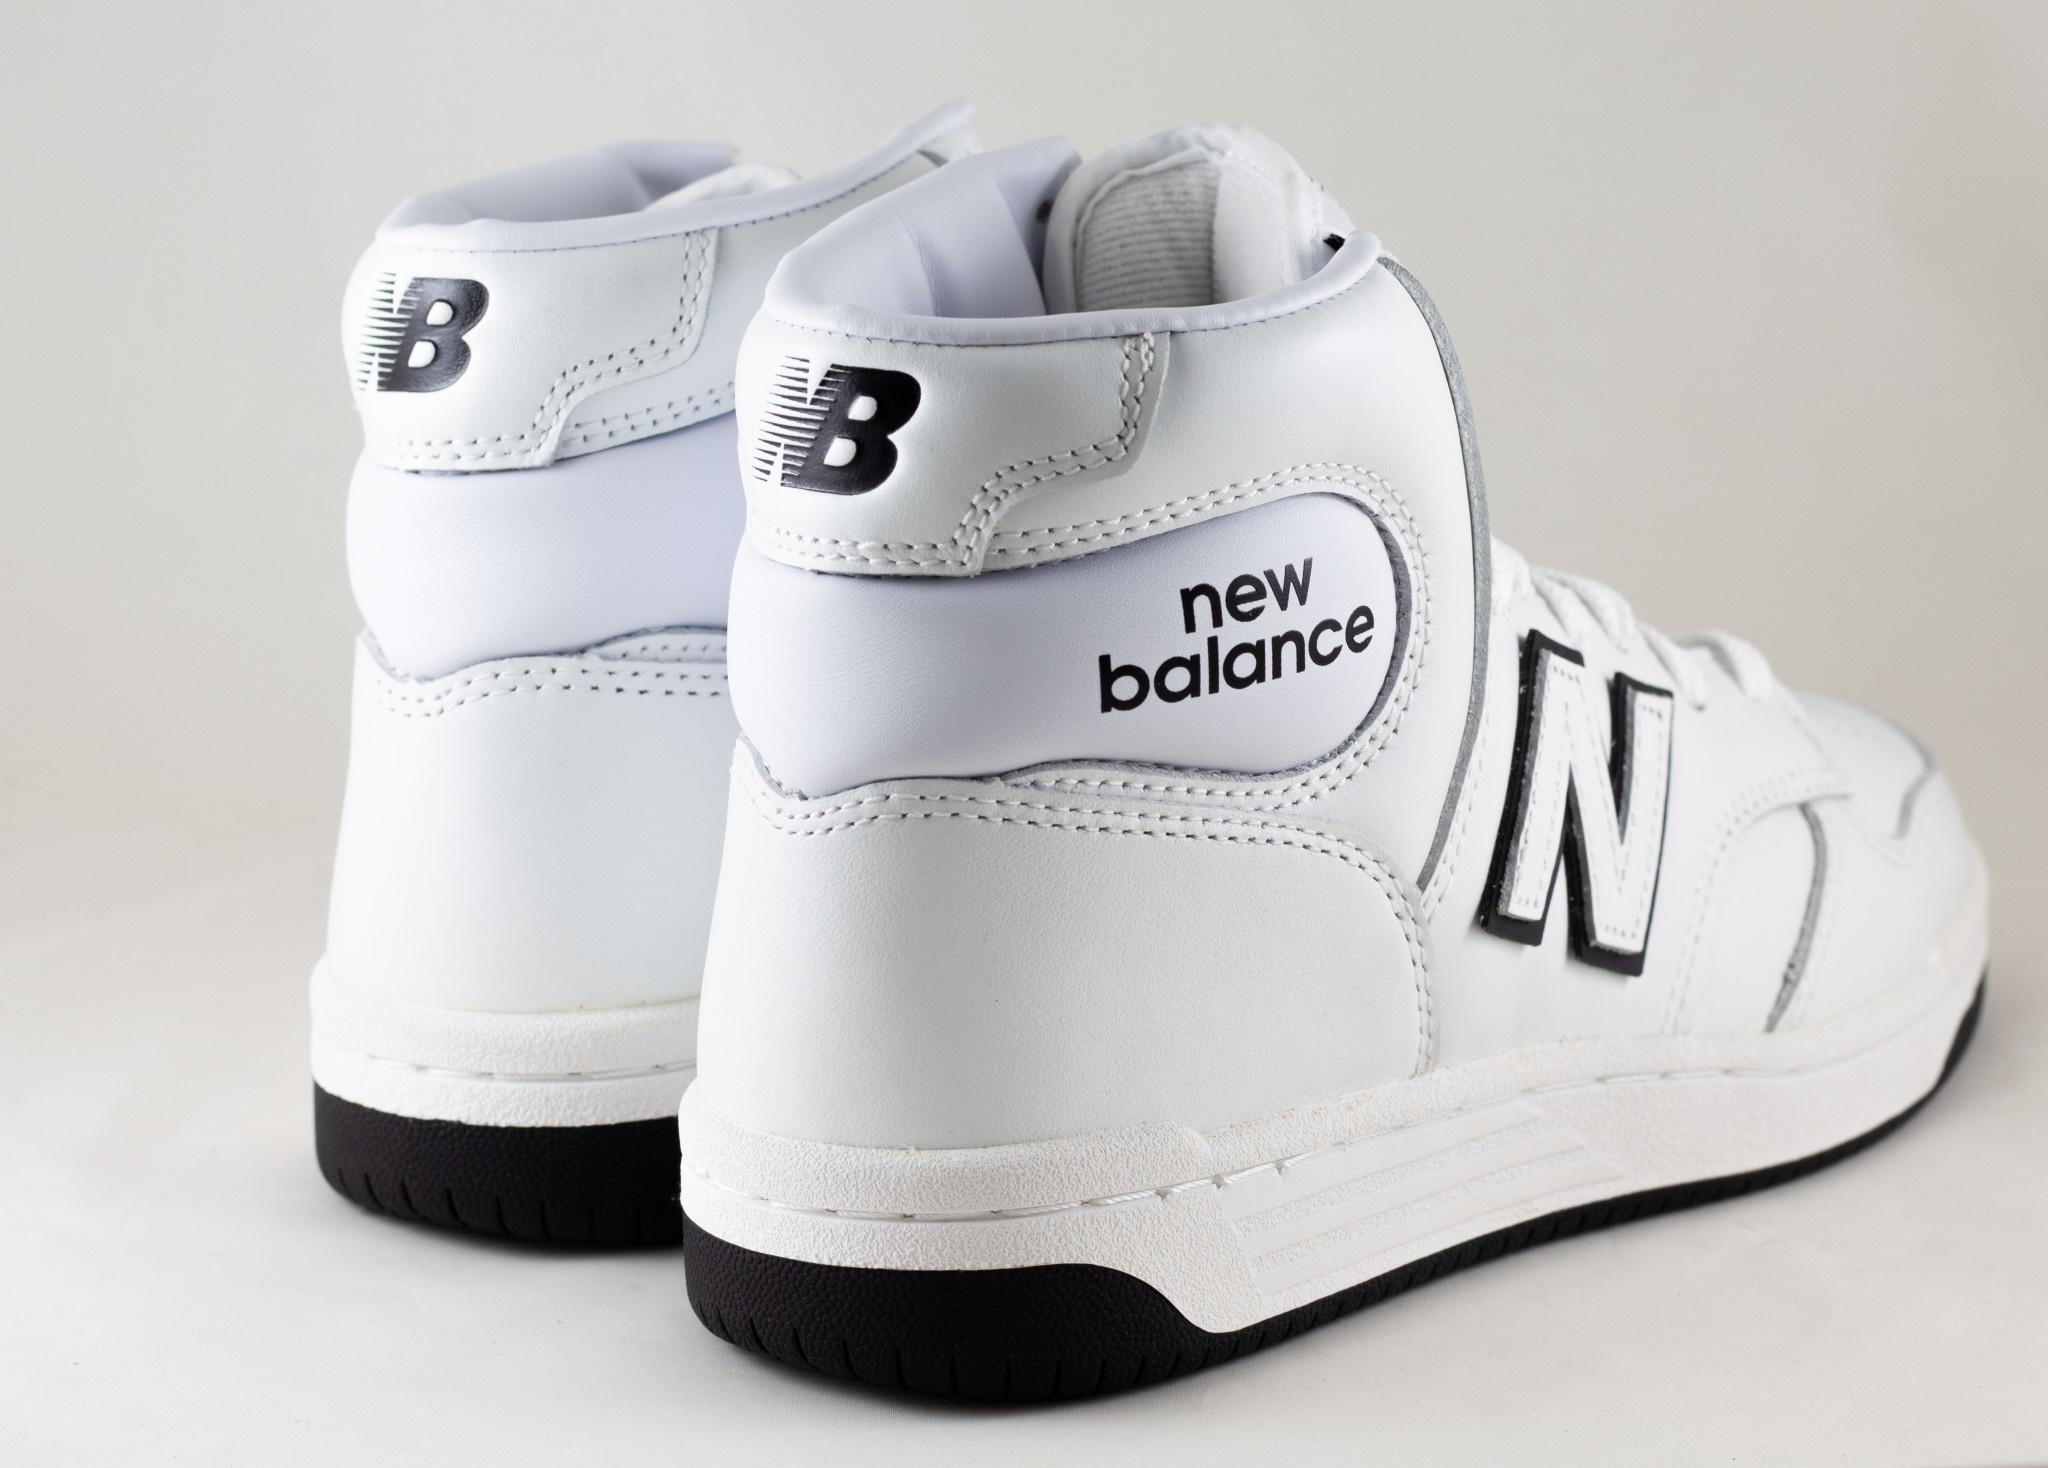 NEW BALANCE BB480HE White/ Black